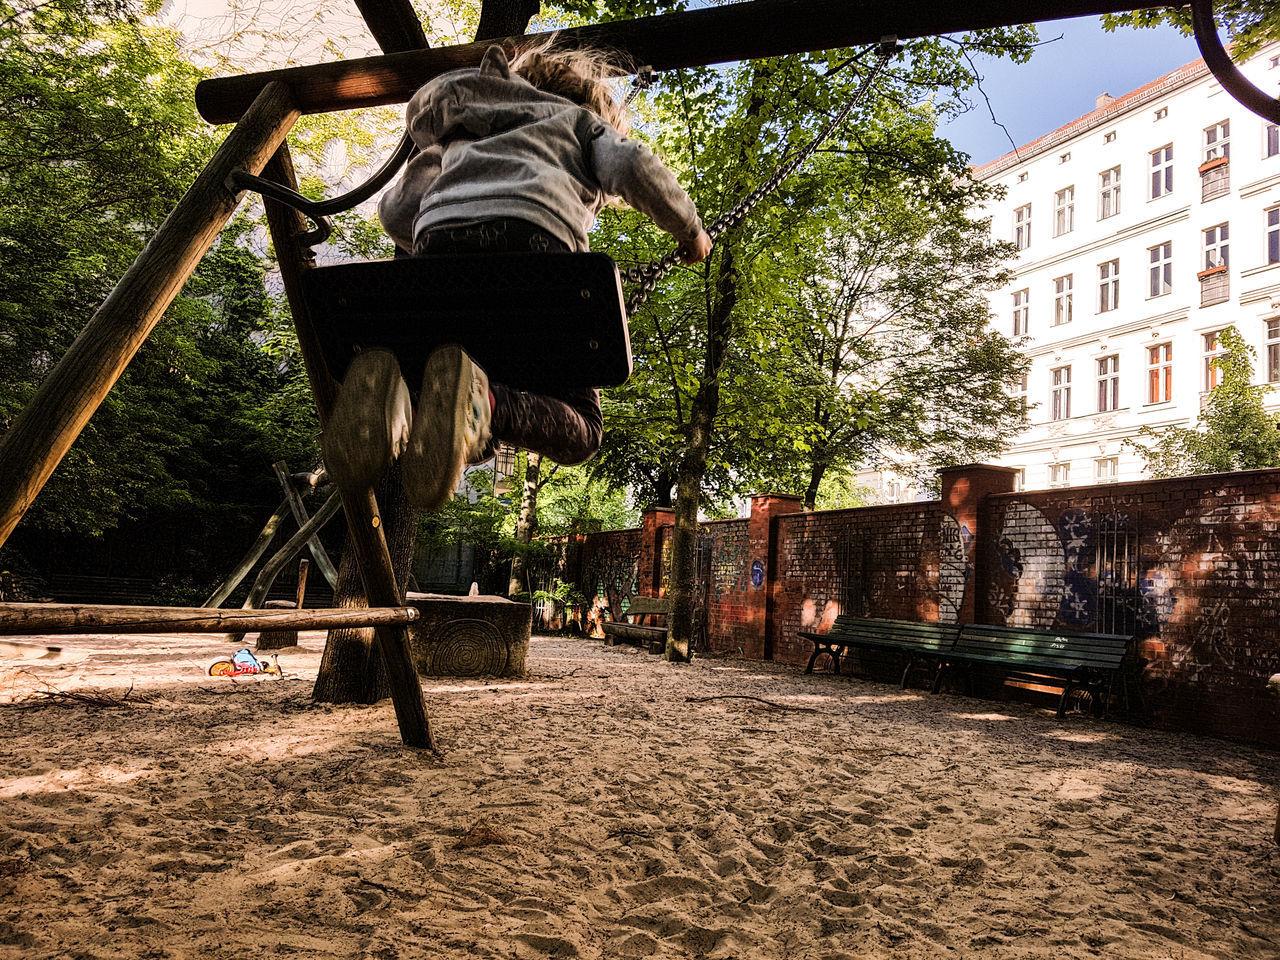 Outdoors Tree Sunlight Swing Playground Berlin Life Wall Kid Kids Playground